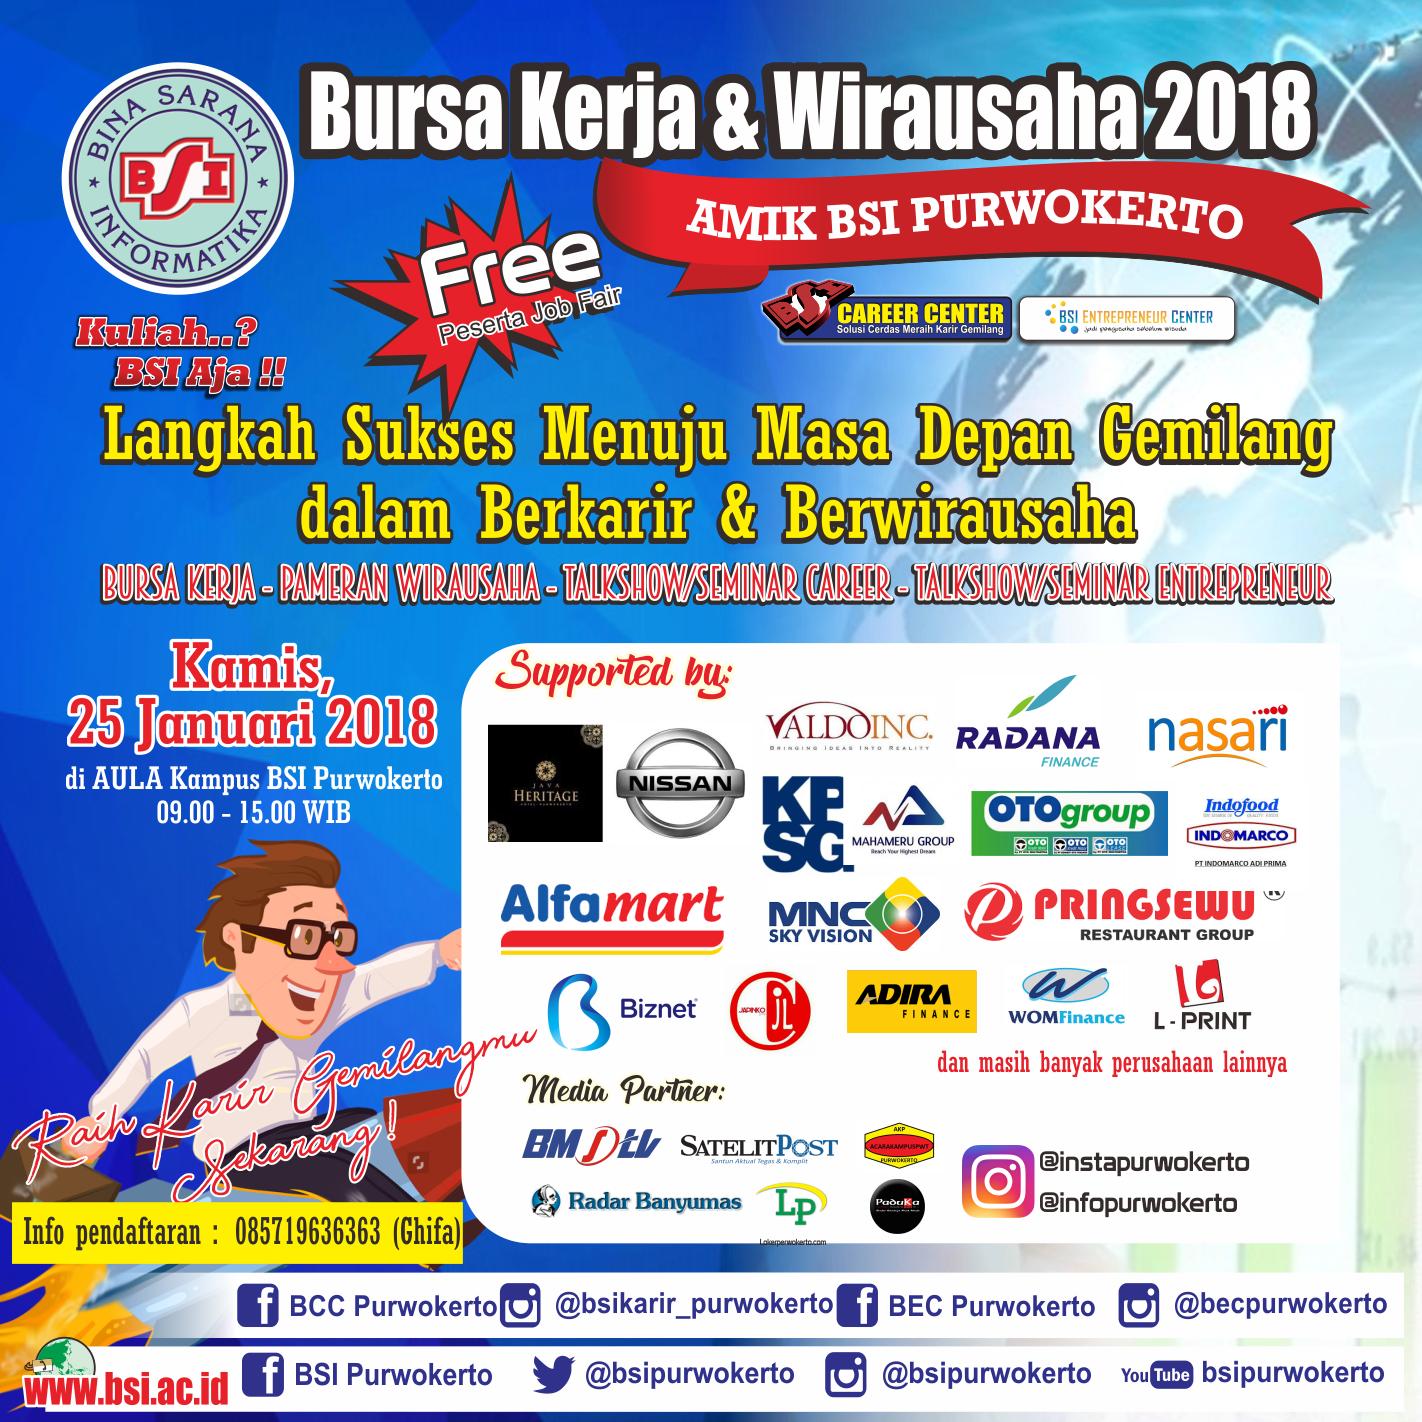 Bursa Kerja dan Pameran Kewirausahaan BSI Purwokerto 2018 ...